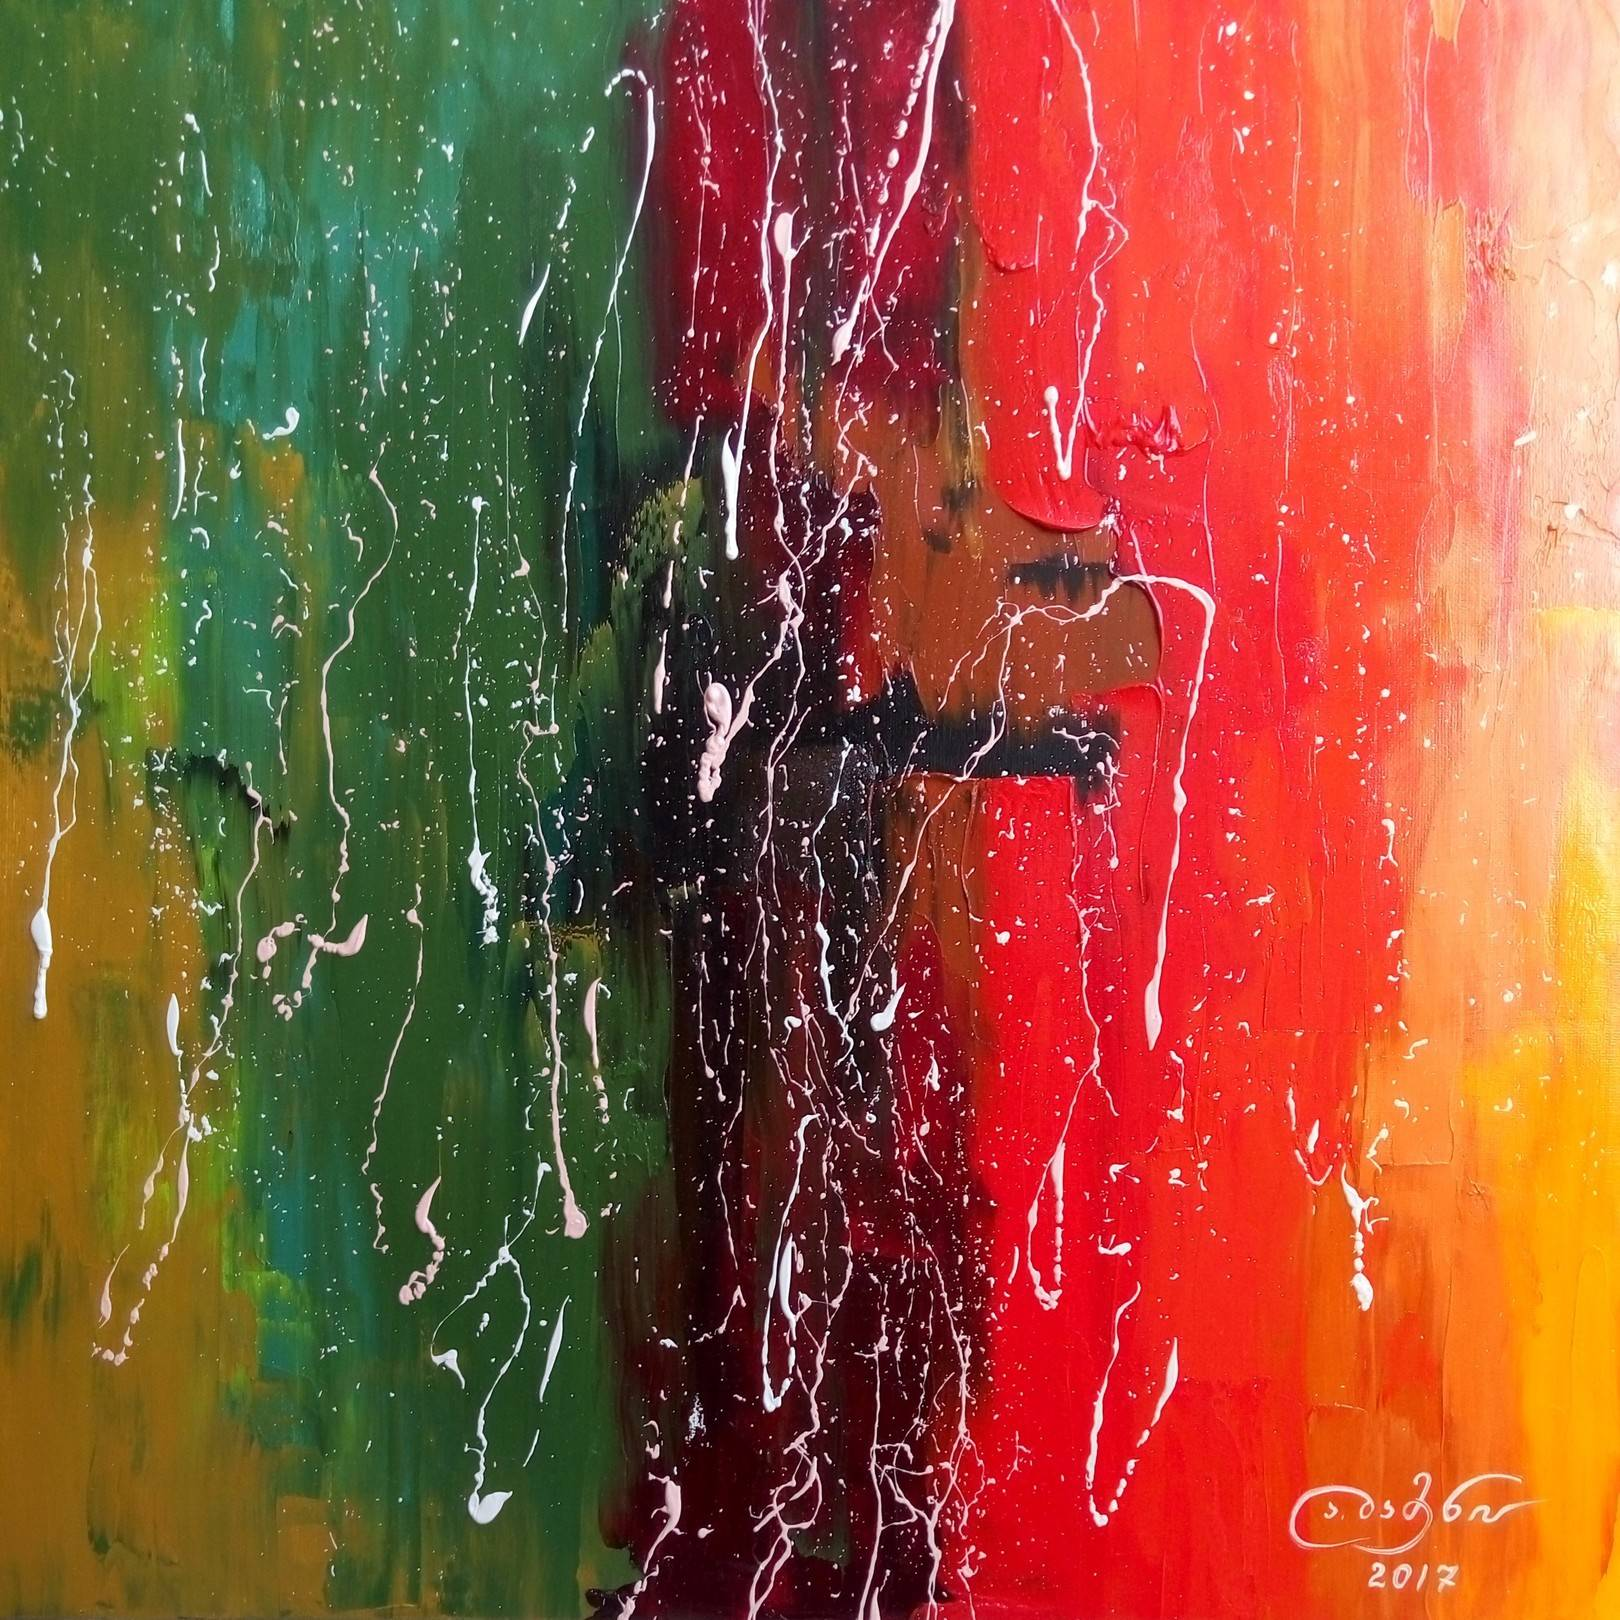 «Вечерняя печаль»  холст, масло «Evening sorrow»      oil on canvas  50x50, 2017